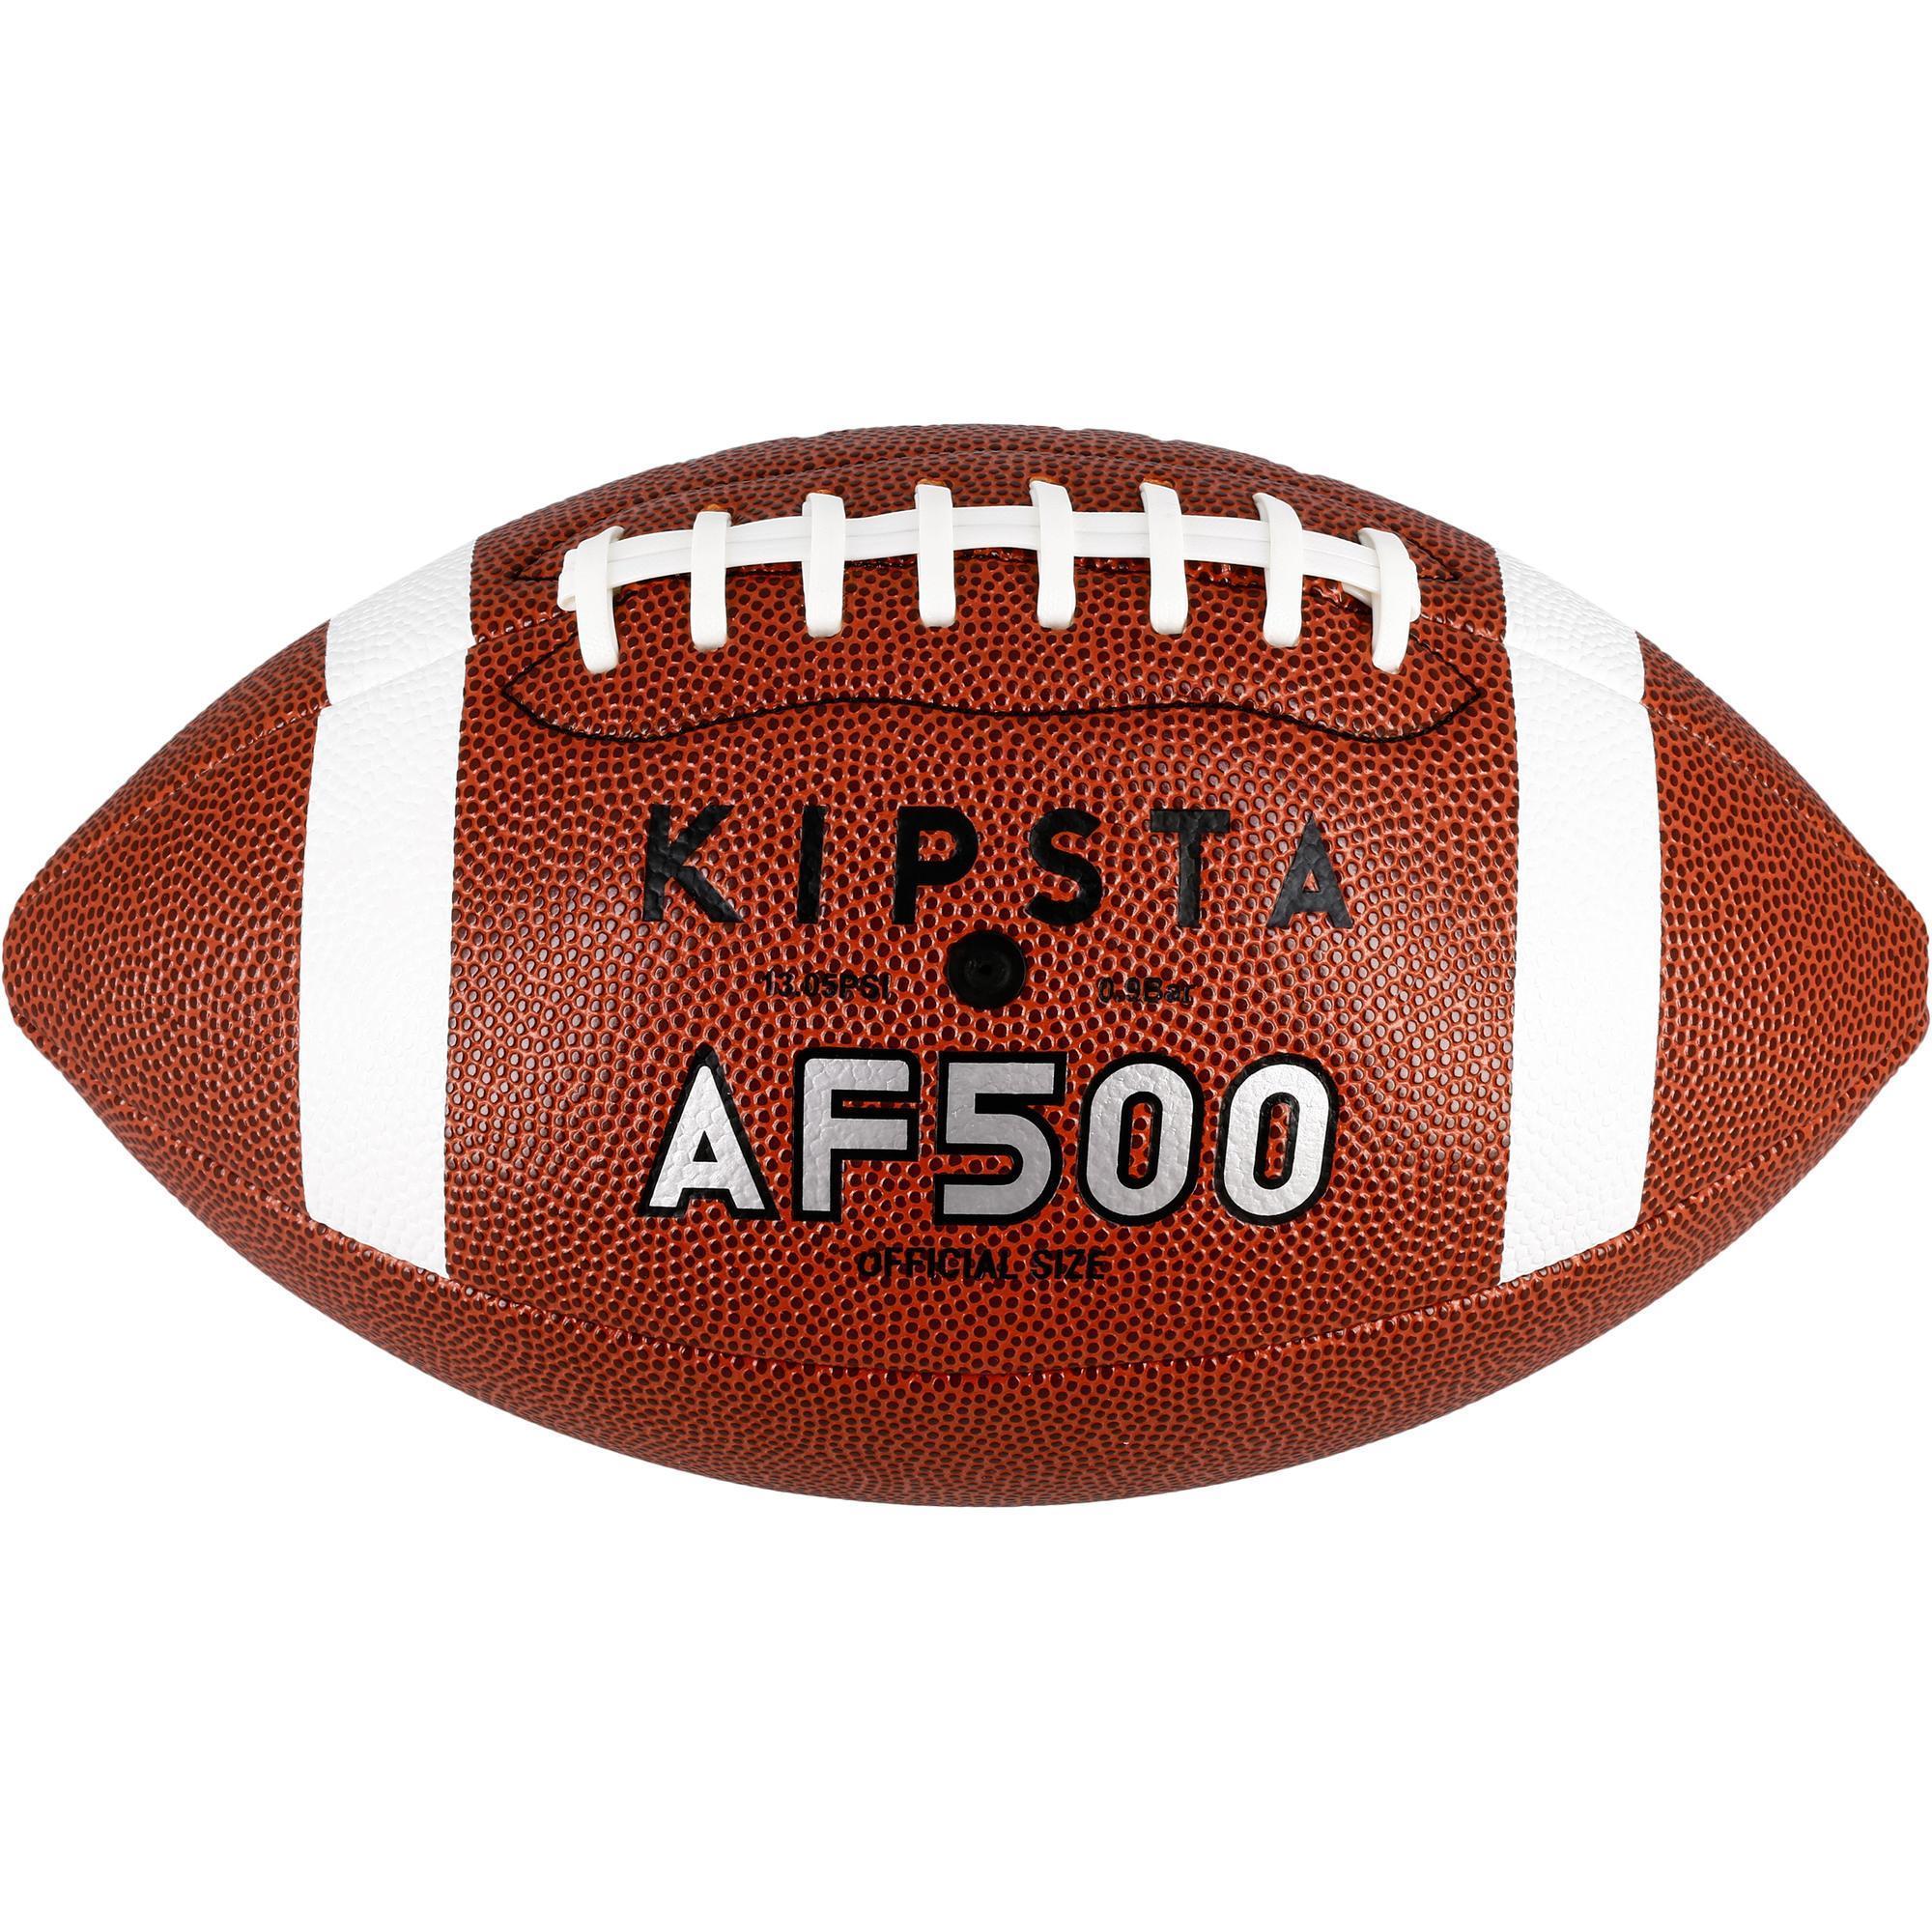 Damen,Herren,Jungen,Kinder American Football AF500 offizielle Erwachsene braun | 03583788200642